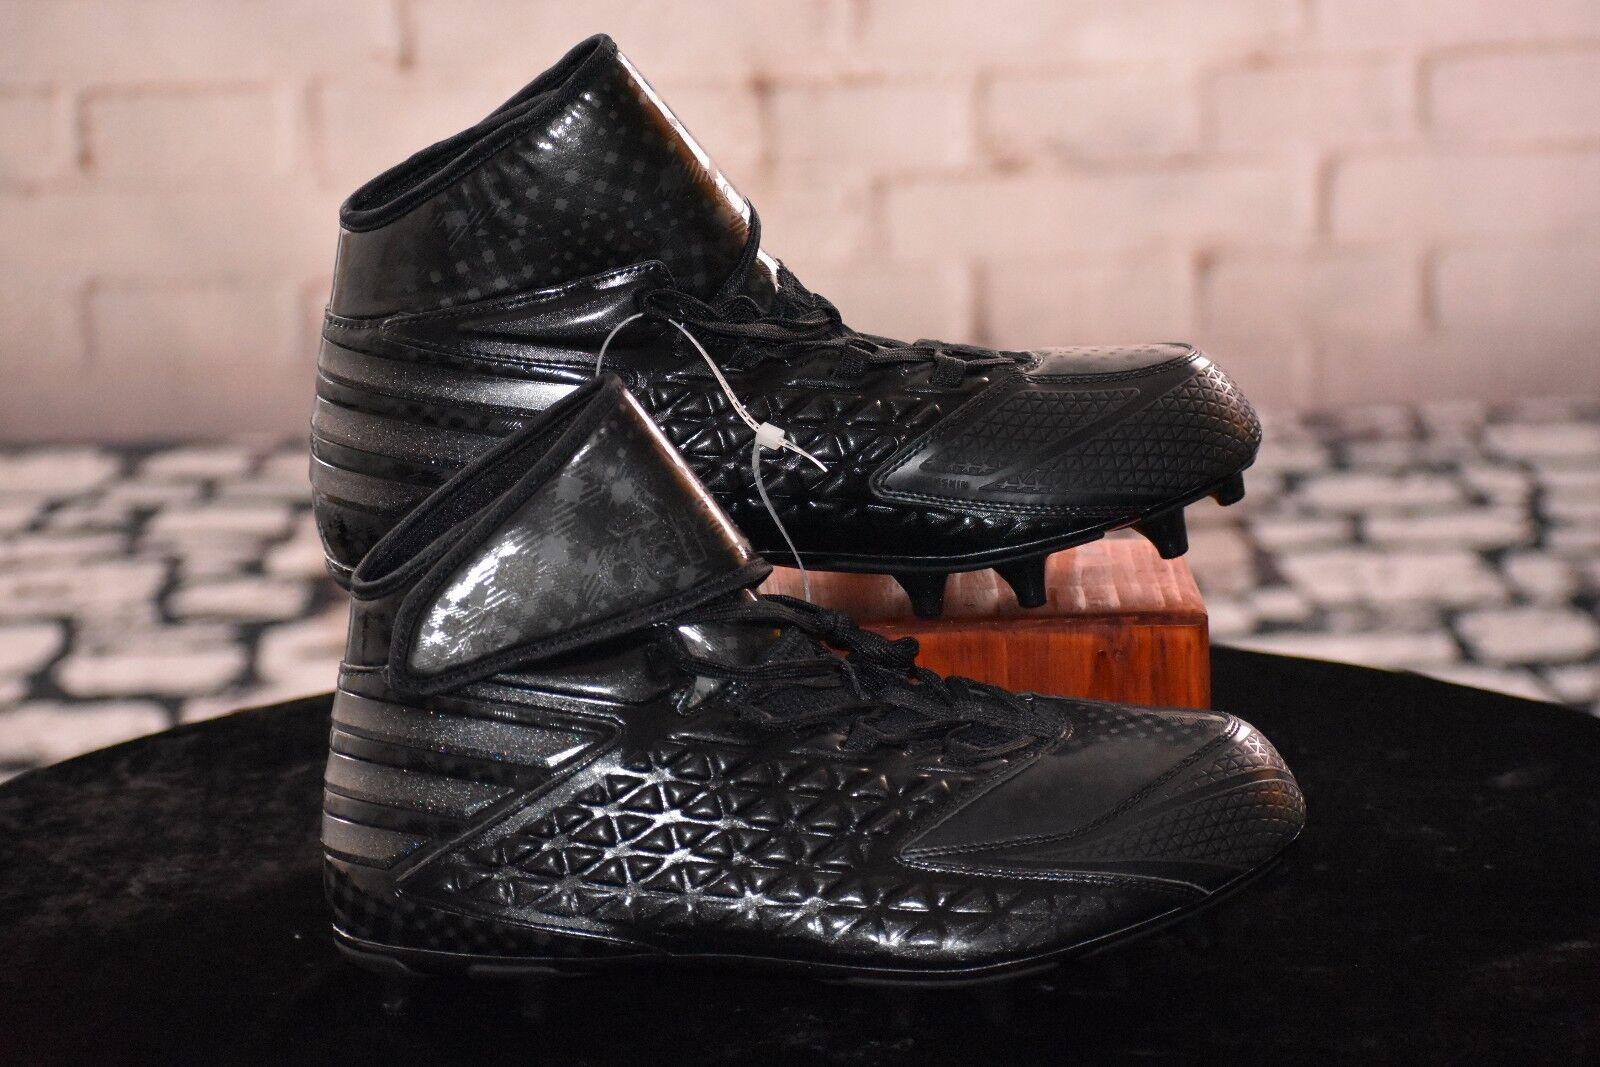 Tacos de alto futbol adidas Hombre monstruo alto de amplio comodo baratos zapatos de mujer zapatos de mujer 19234a